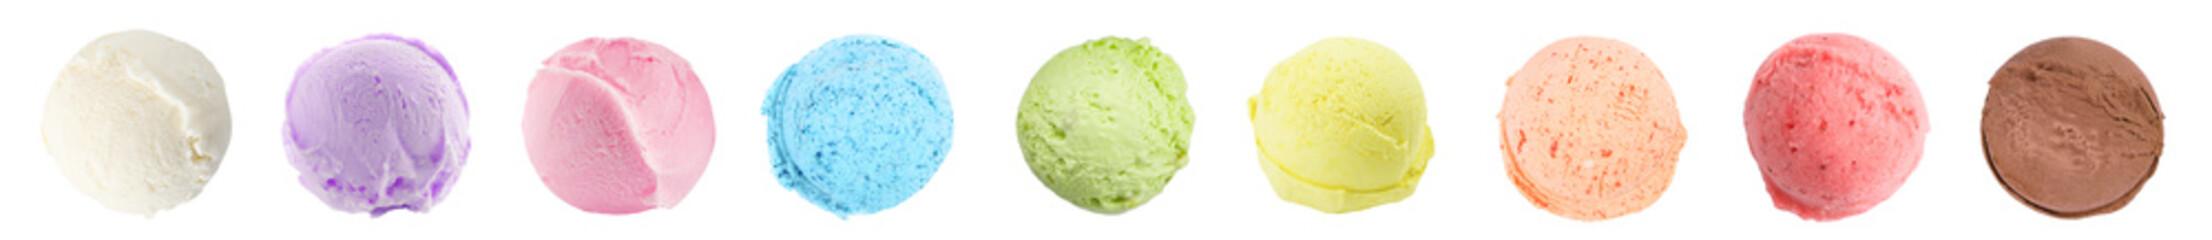 Scoop of delicious ice cream on white background